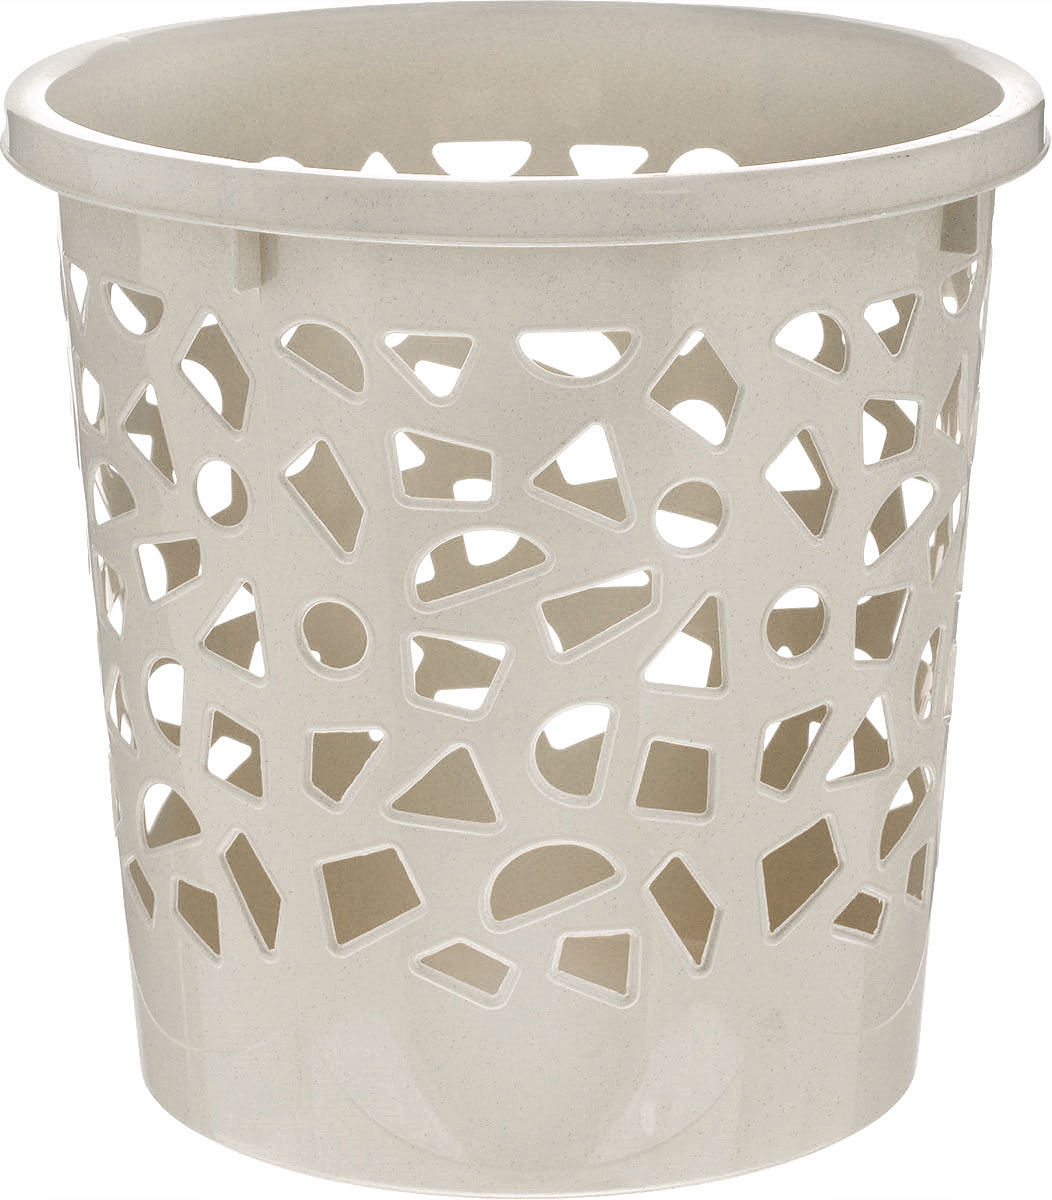 Корзина для мусора Бытпласт, цвет: серо-бежевый, высота 26 см корзина для мусора бытпласт цвет серо бежевый высота 26 см